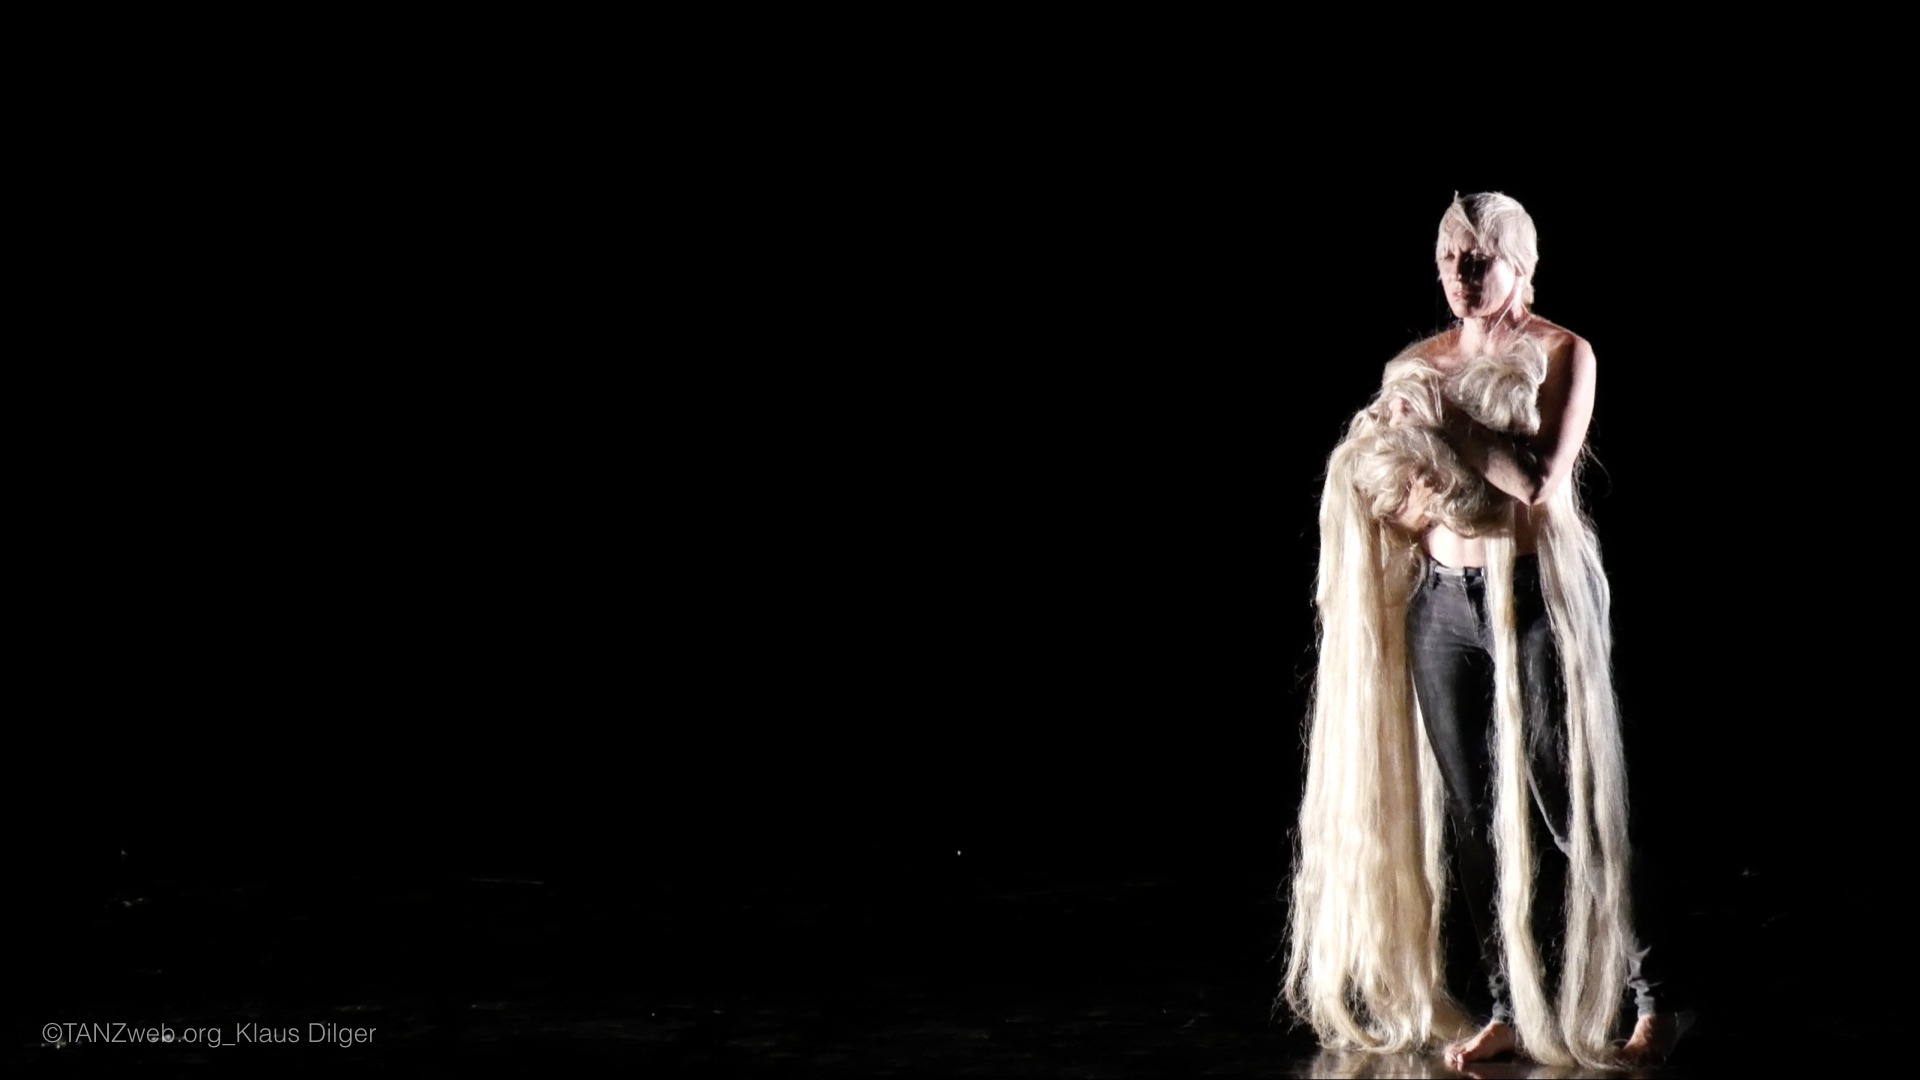 ©PRESSEBILDER Klaus Dilger_TANZWEB Verleihung Deutscher Tanzpreis 2018 in Essen Meg Stuart - All Songs have been exhausted